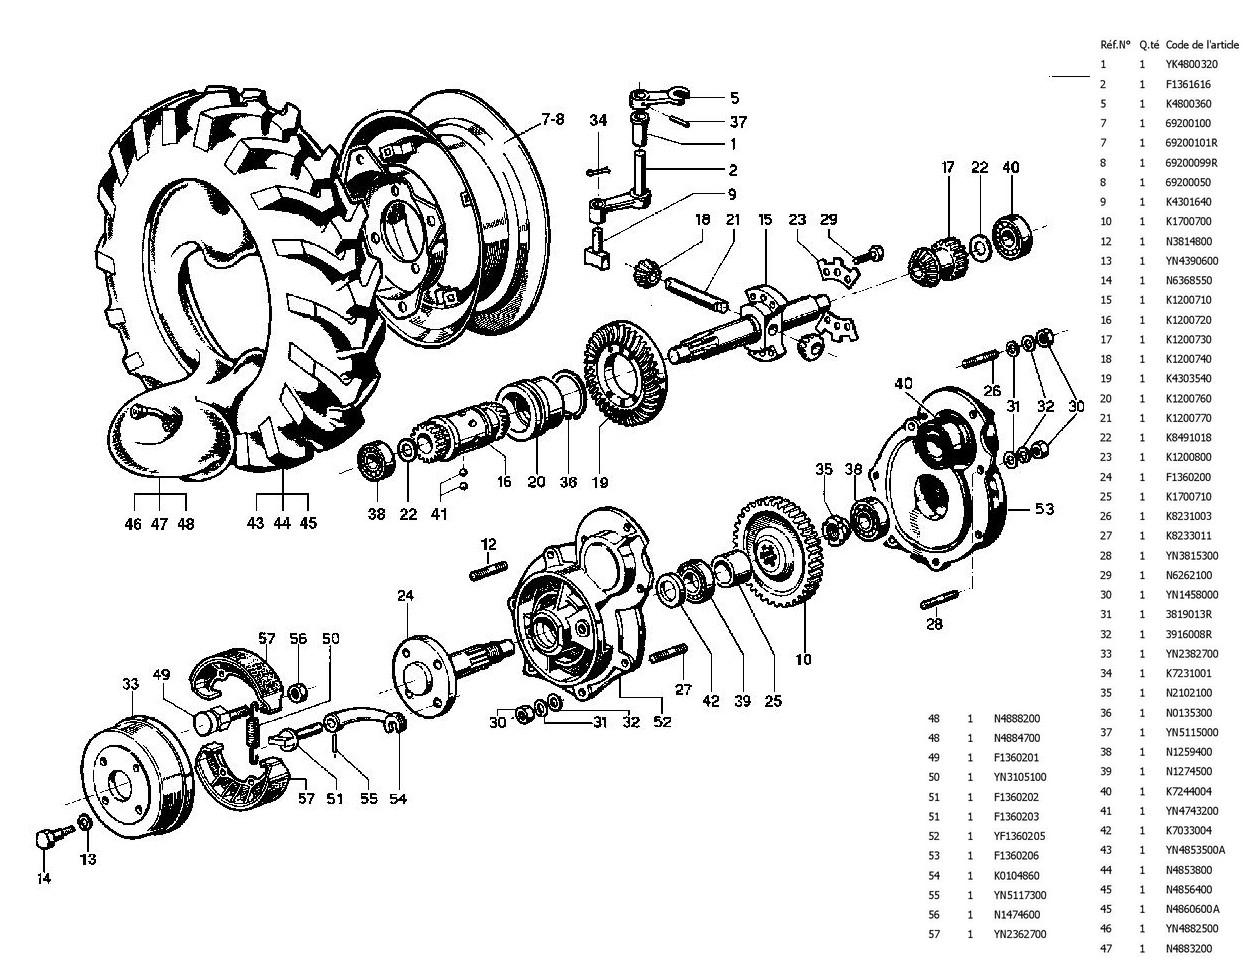 vue eclatee arbre et frein de roue MAXTER H4S